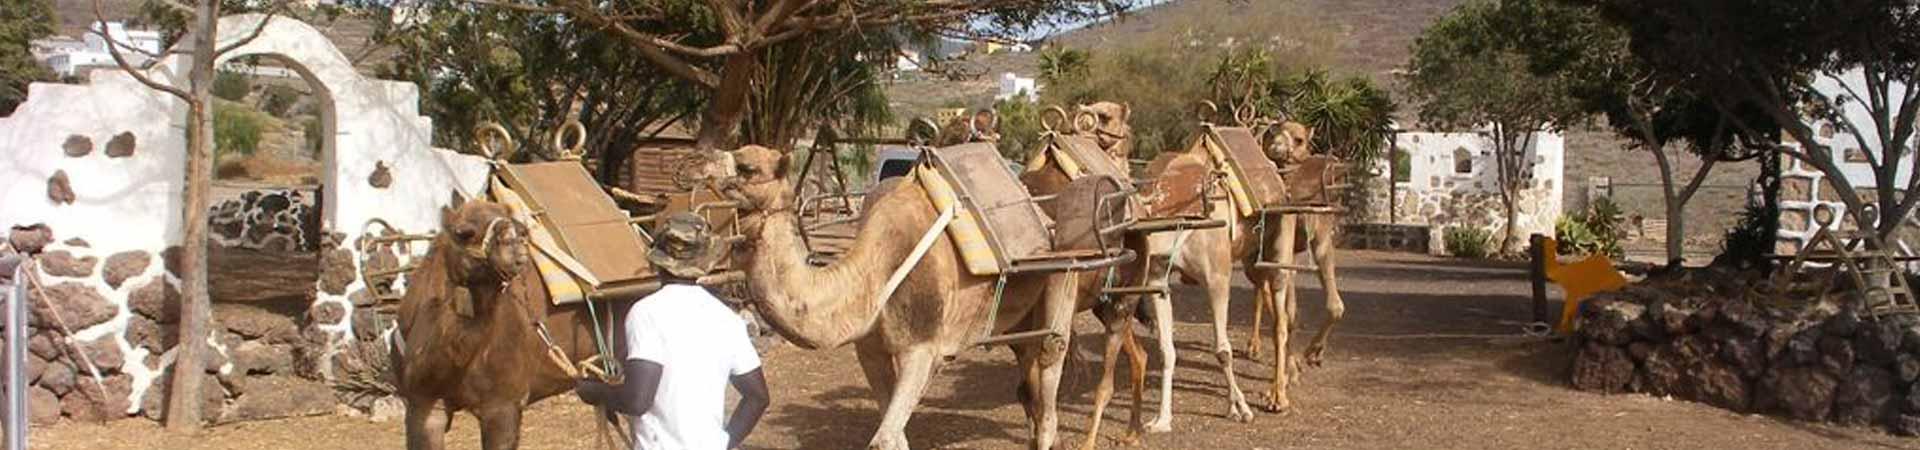 https://www.goodmorningtenerife.com/wp-content/uploads/2015/07/02_slide_camel-park-1920x450-1.jpg